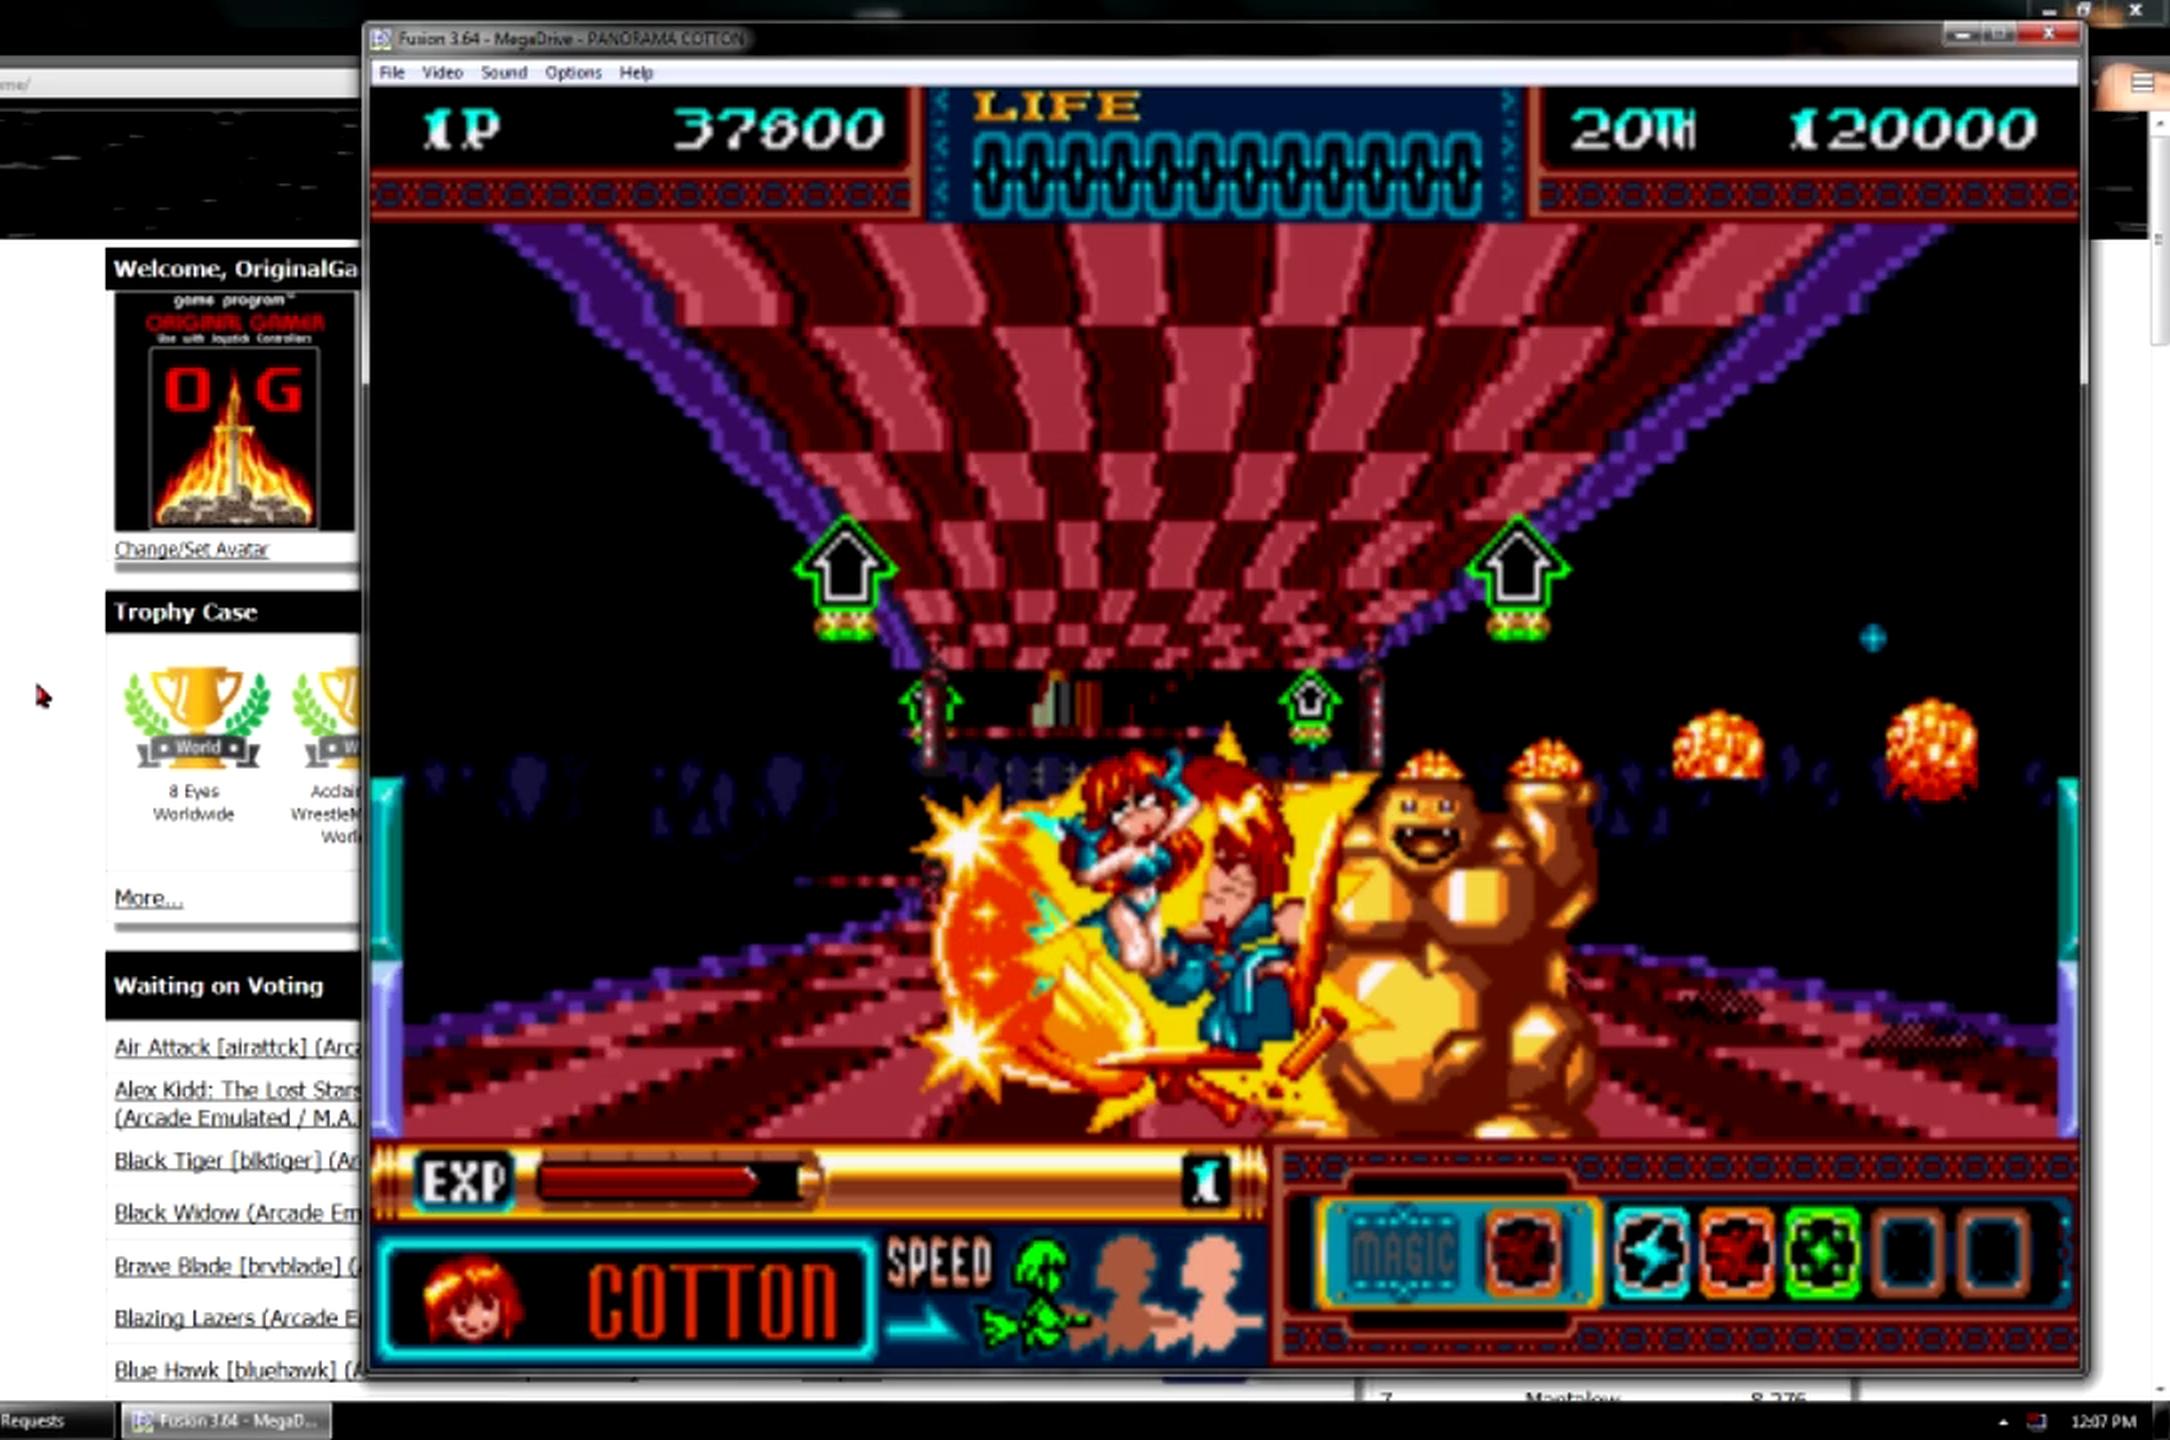 OriginalGamer: Panorama Cotton (Sega Genesis / MegaDrive Emulated) 37,800 points on 2015-06-20 19:06:15